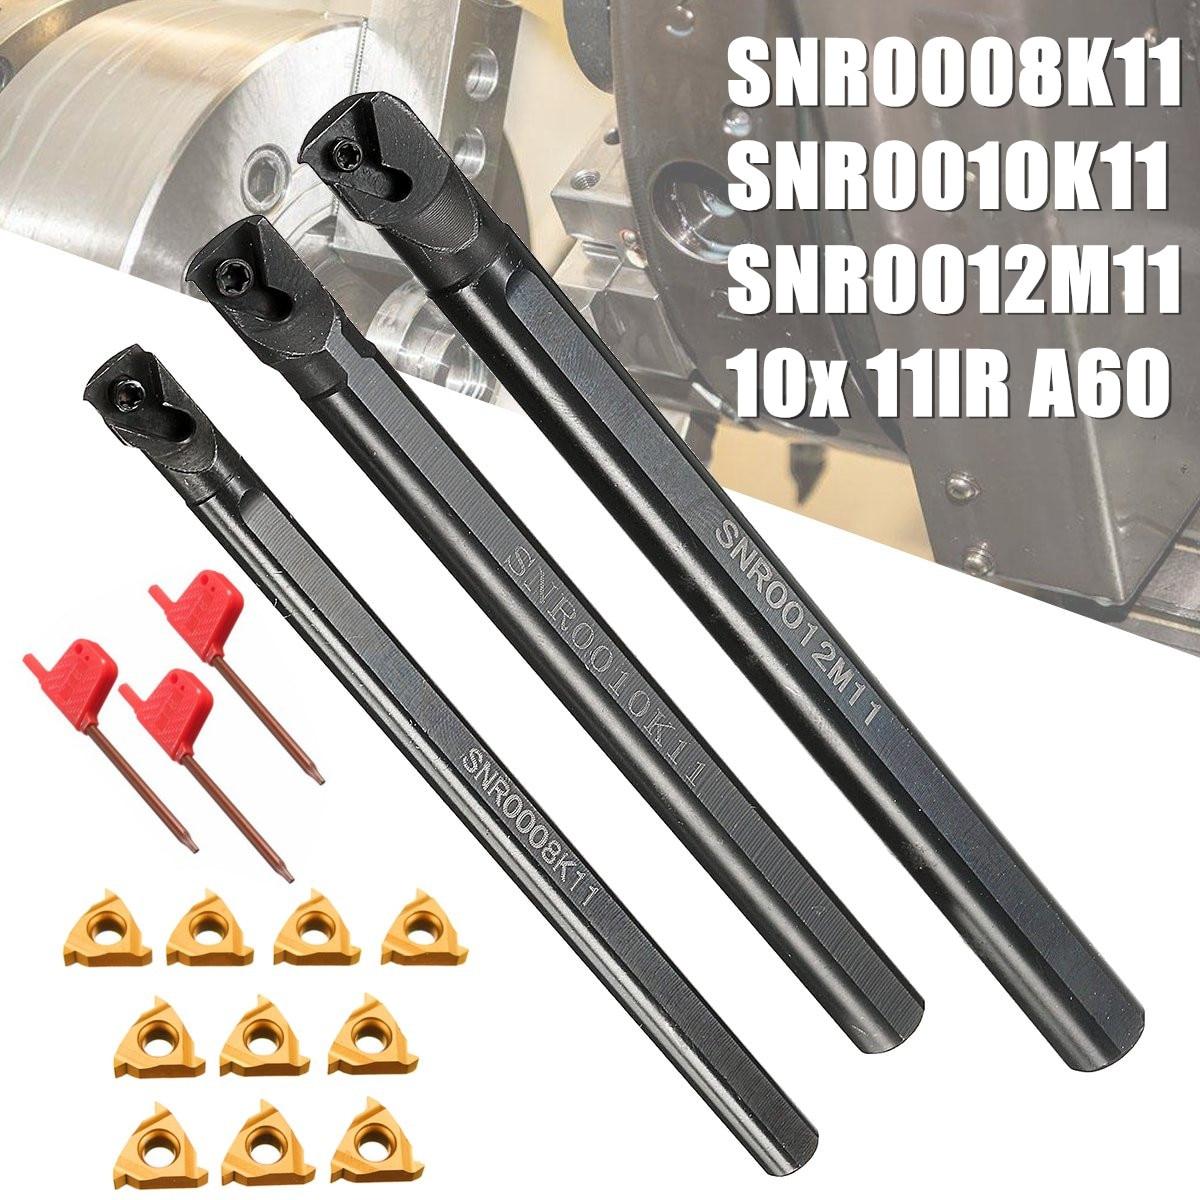 3 set SNR0008K11+SNR0010K11+SNR0012M11 Lathe Boring Bar Stainless Steel 3Pcs wrench+ 10x 11IR A60 Insert Wrench3 set SNR0008K11+SNR0010K11+SNR0012M11 Lathe Boring Bar Stainless Steel 3Pcs wrench+ 10x 11IR A60 Insert Wrench